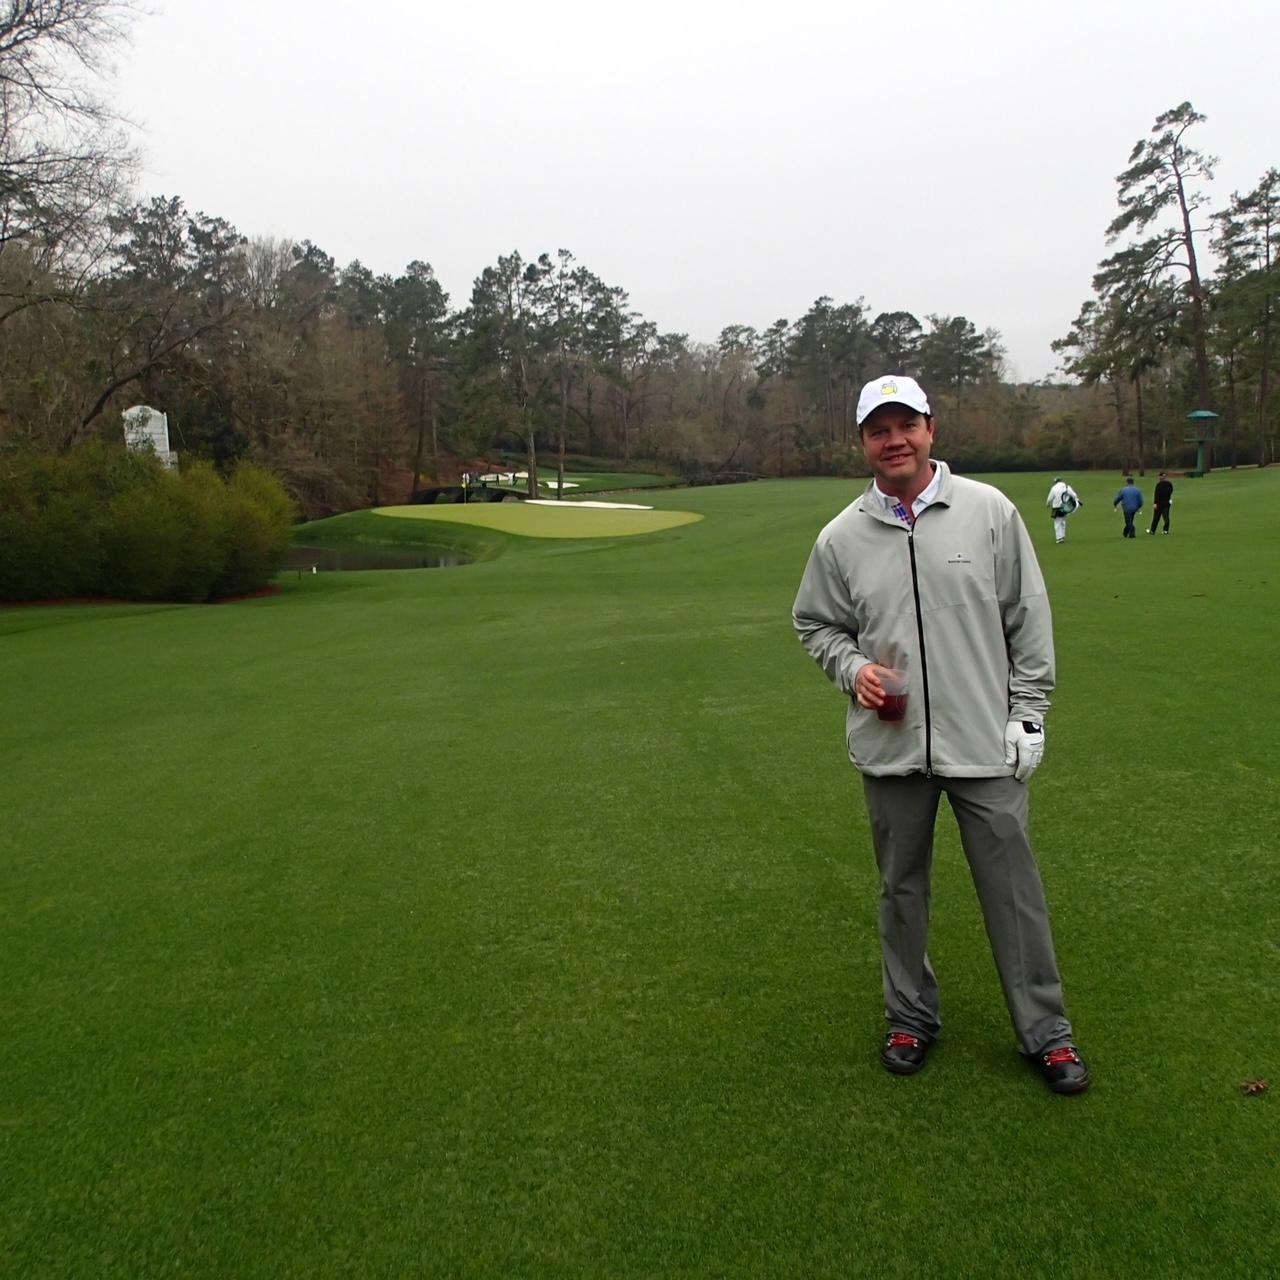 David Osborne Austin out golfing